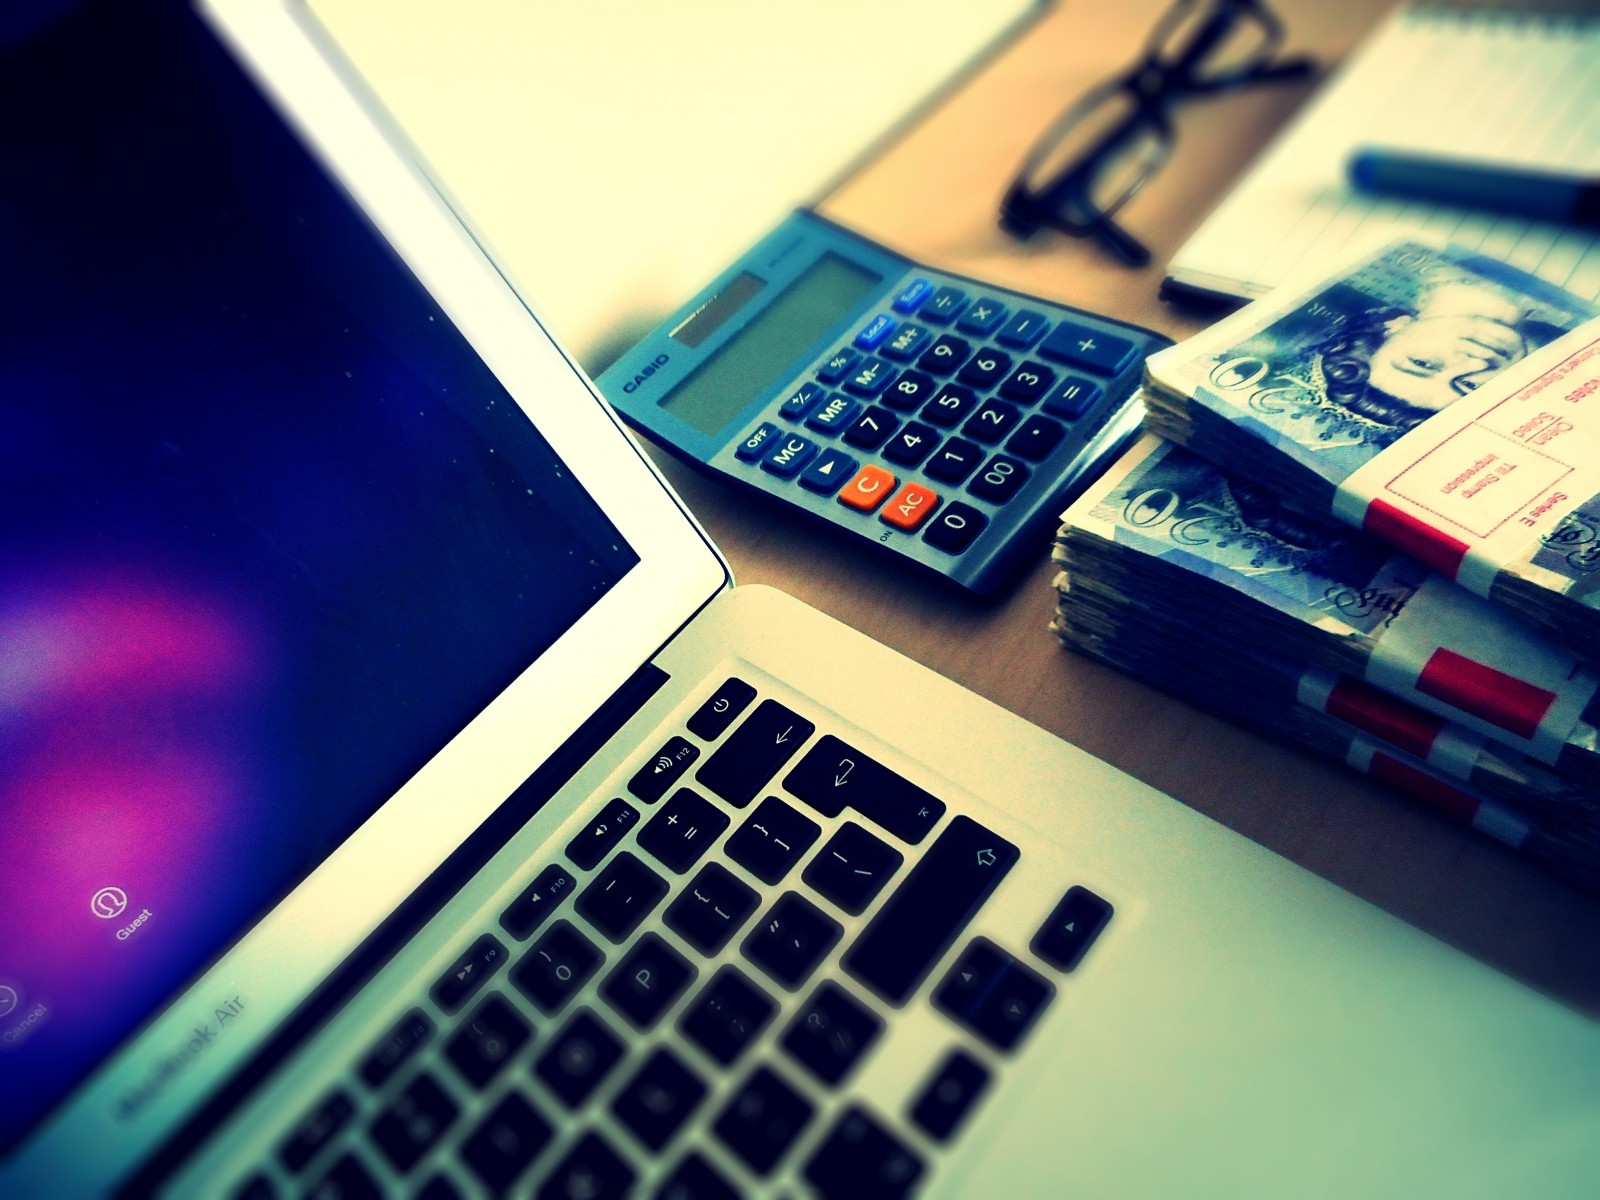 money-computer-desk-finance-success-internet